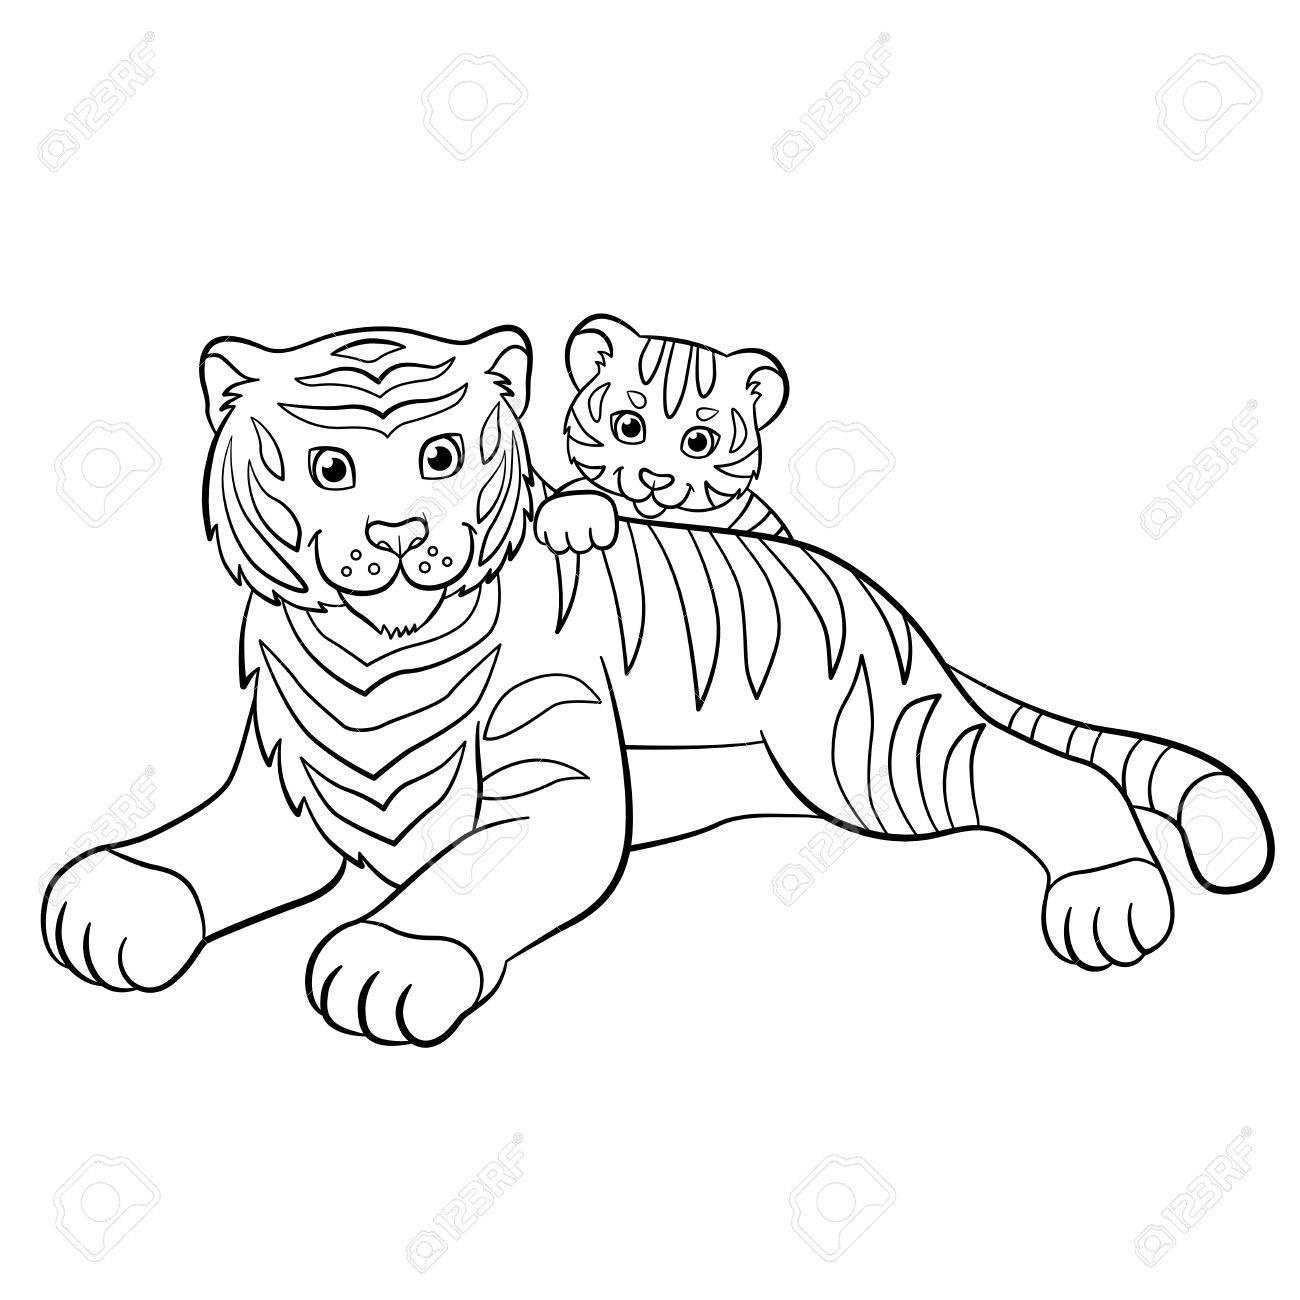 Coloriage Bebe Animau.Coloriage Animaux Sauvages Sourire Mere Tigre Avec Son Petit Bebe Tigre Mignon